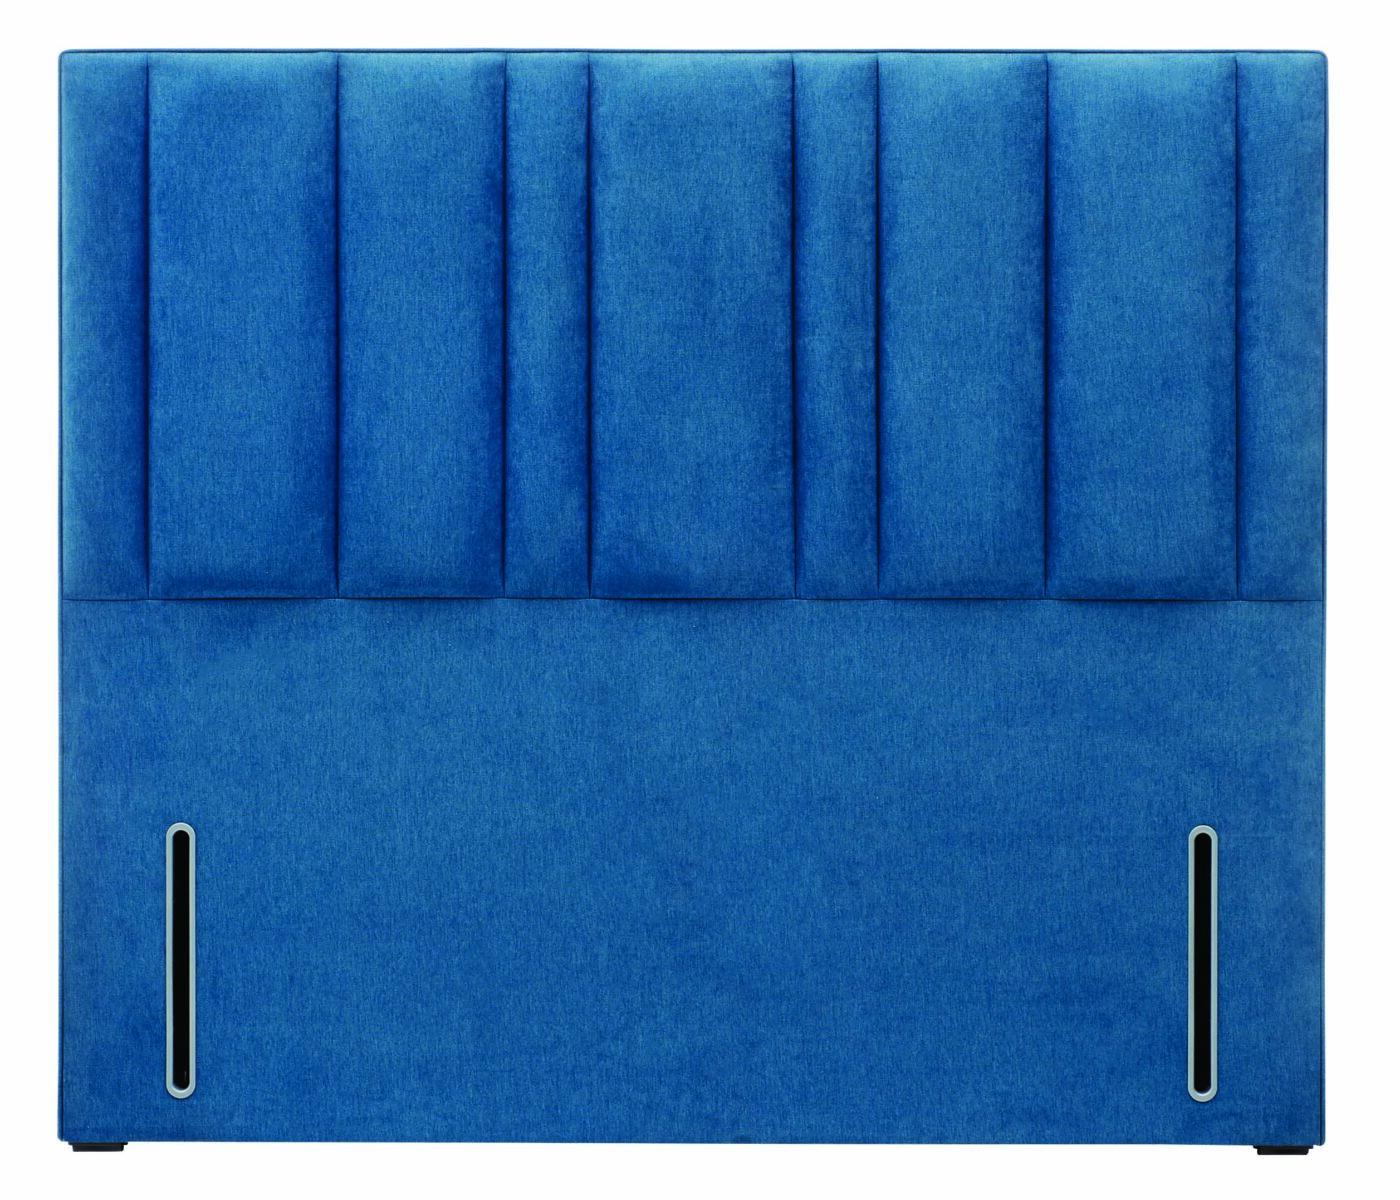 Hypnos Harriett HB Euro Slim Imperio 602 Turquoise HR e1604471412452 i Vigna